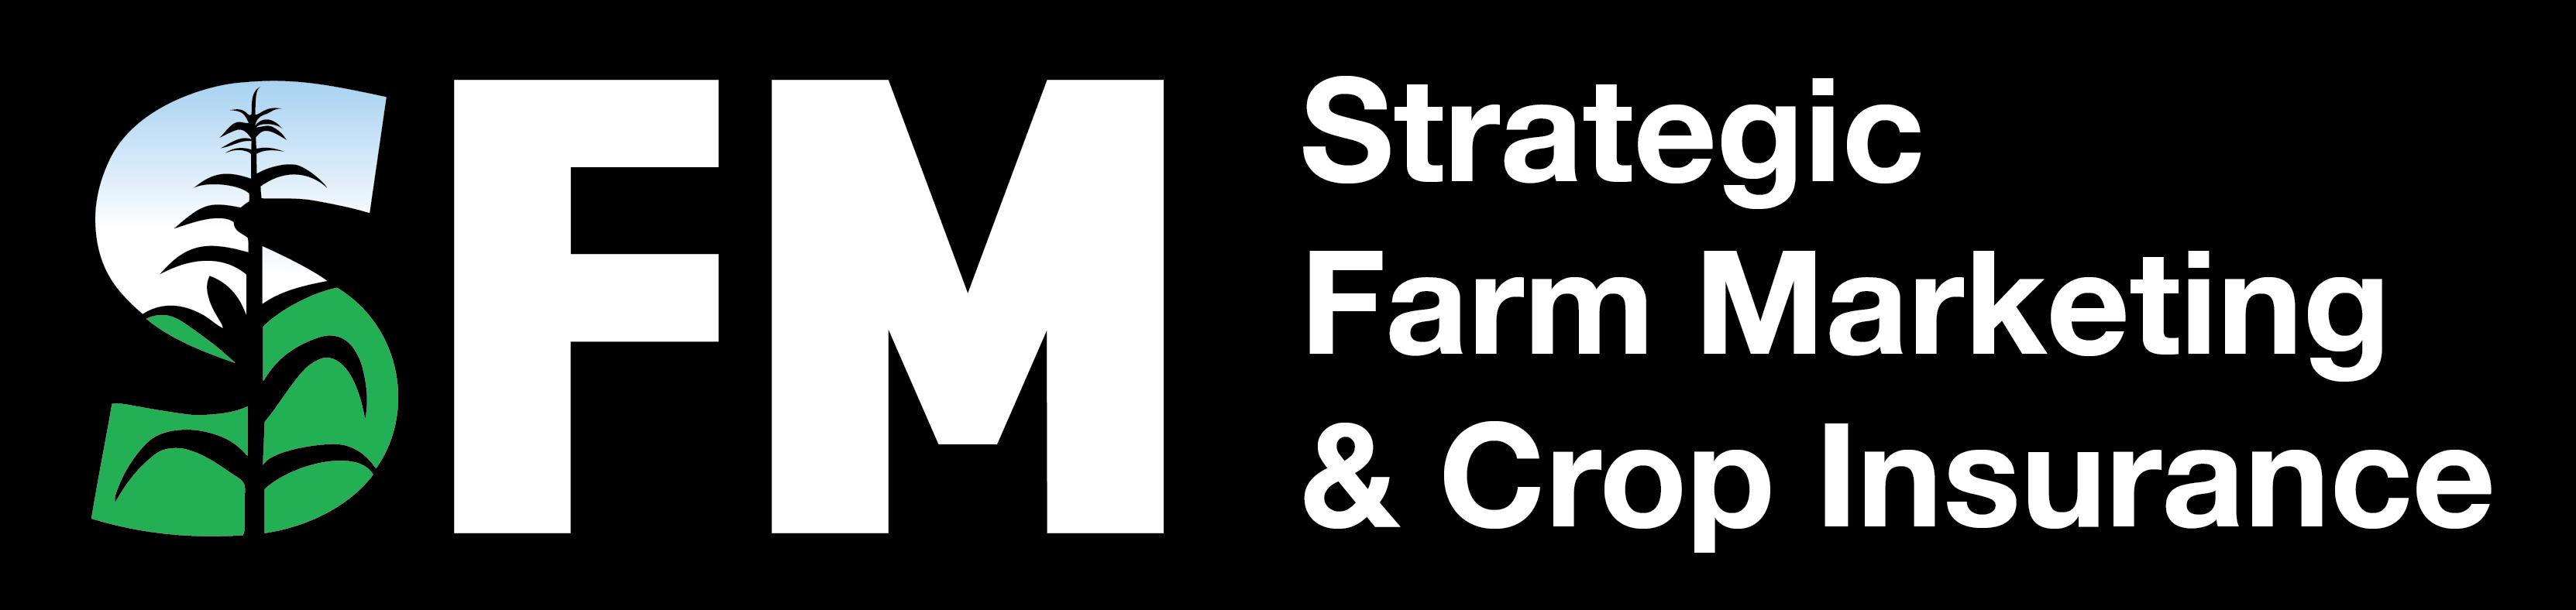 SFM logo white on black